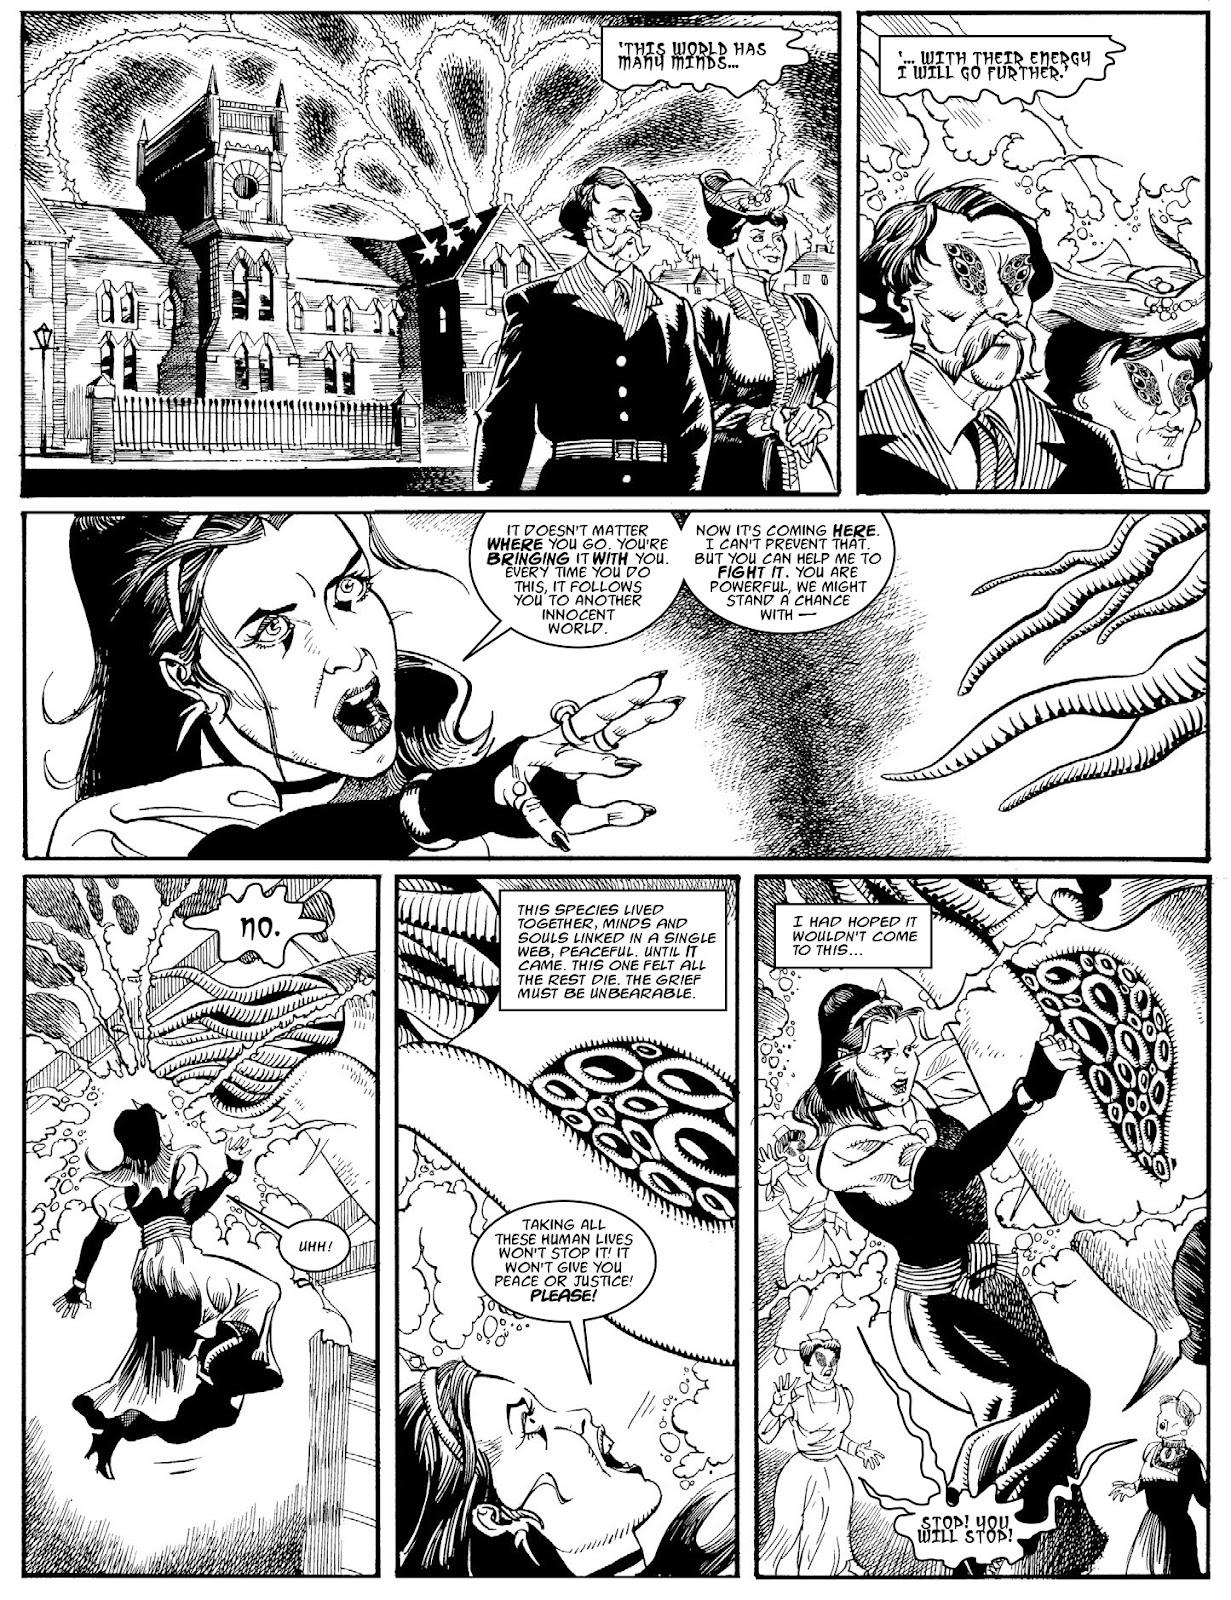 Judge Dredd Megazine (Vol. 5) issue 427 - Page 74